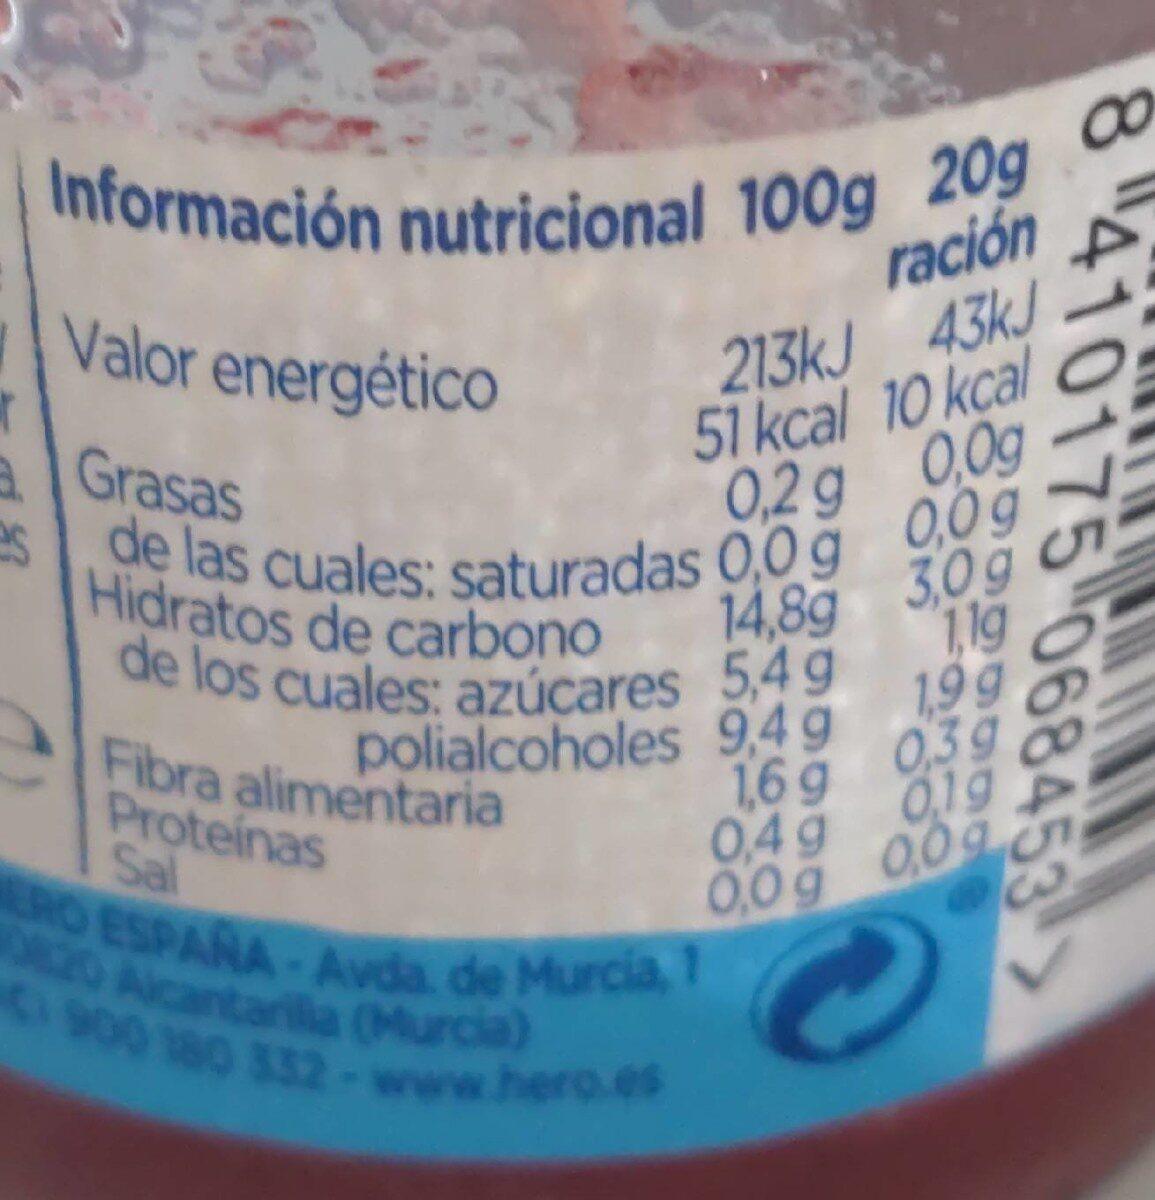 Mermelada de fresa - Nutrition facts - es